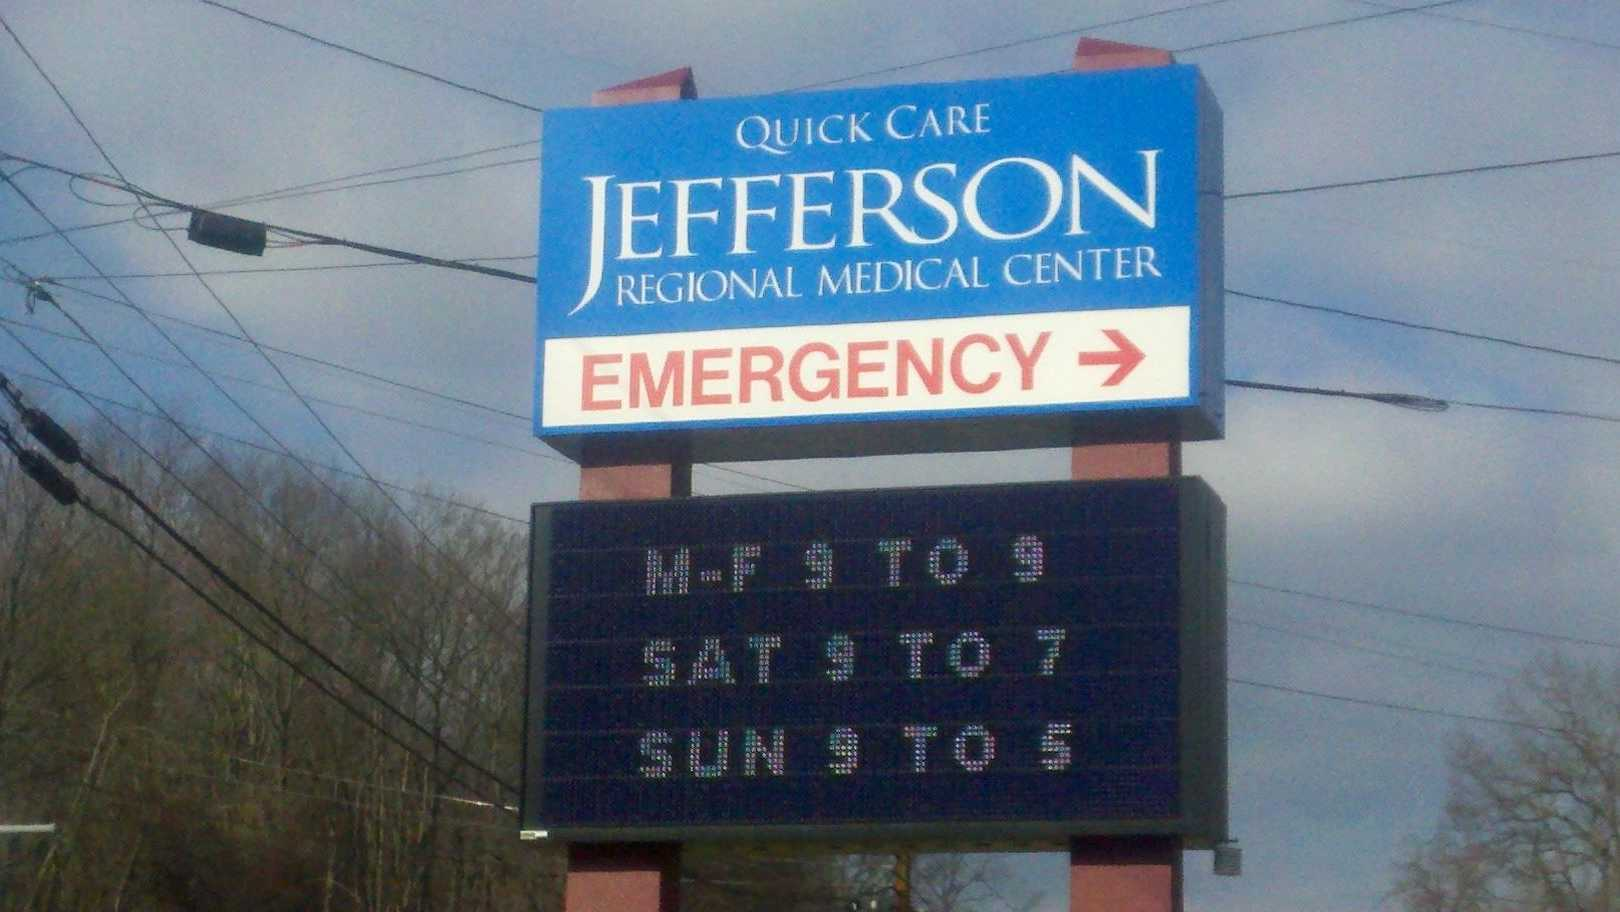 Jefferson Regional Medical Center